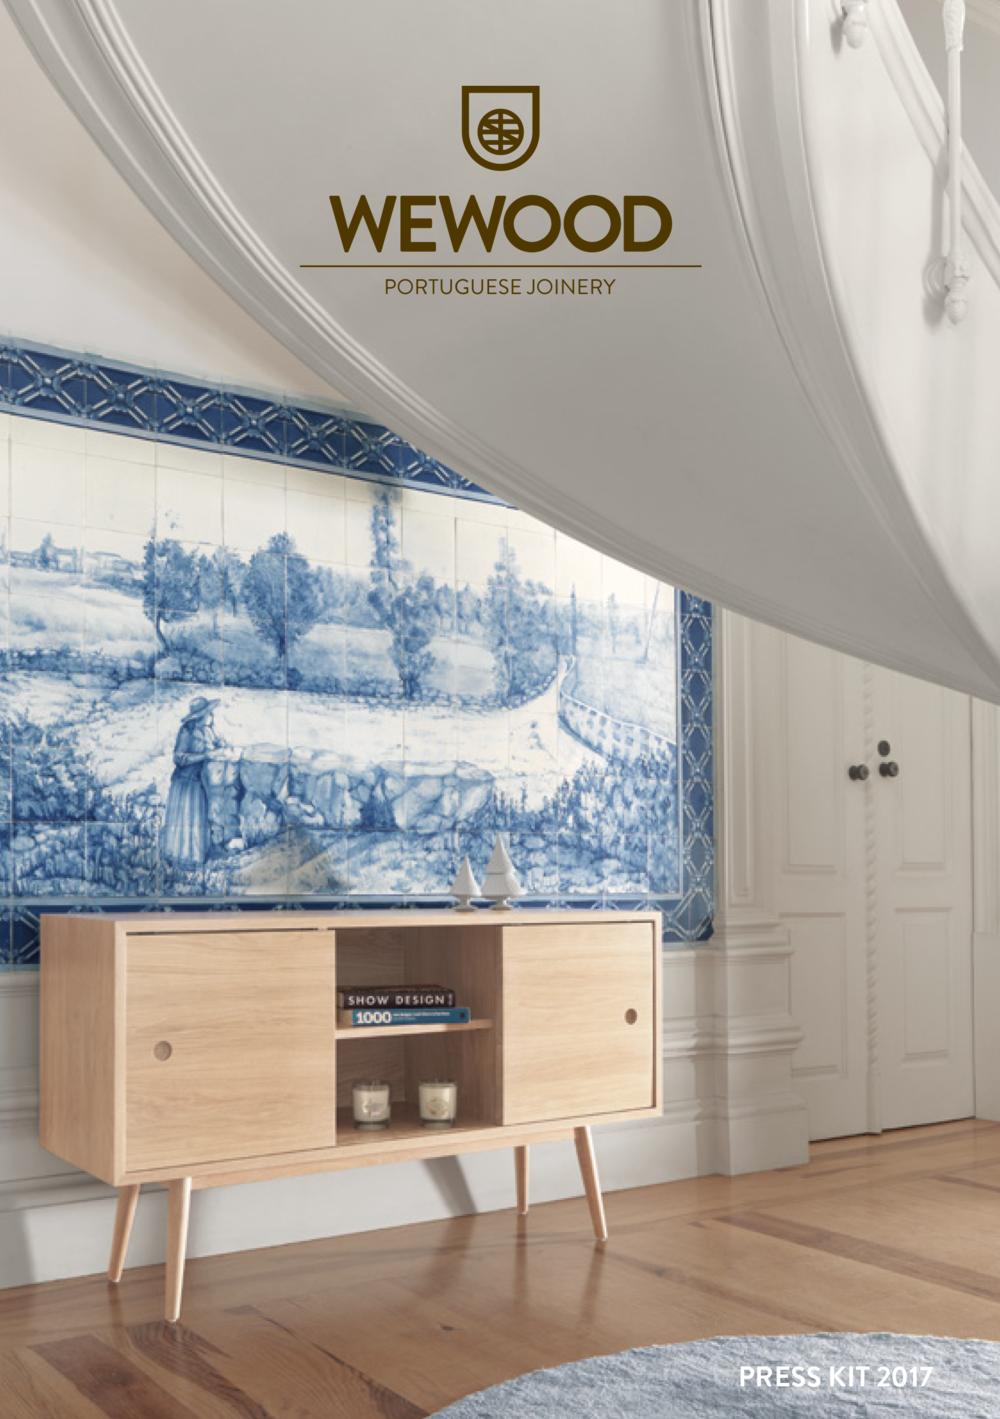 Press Kit Wewood